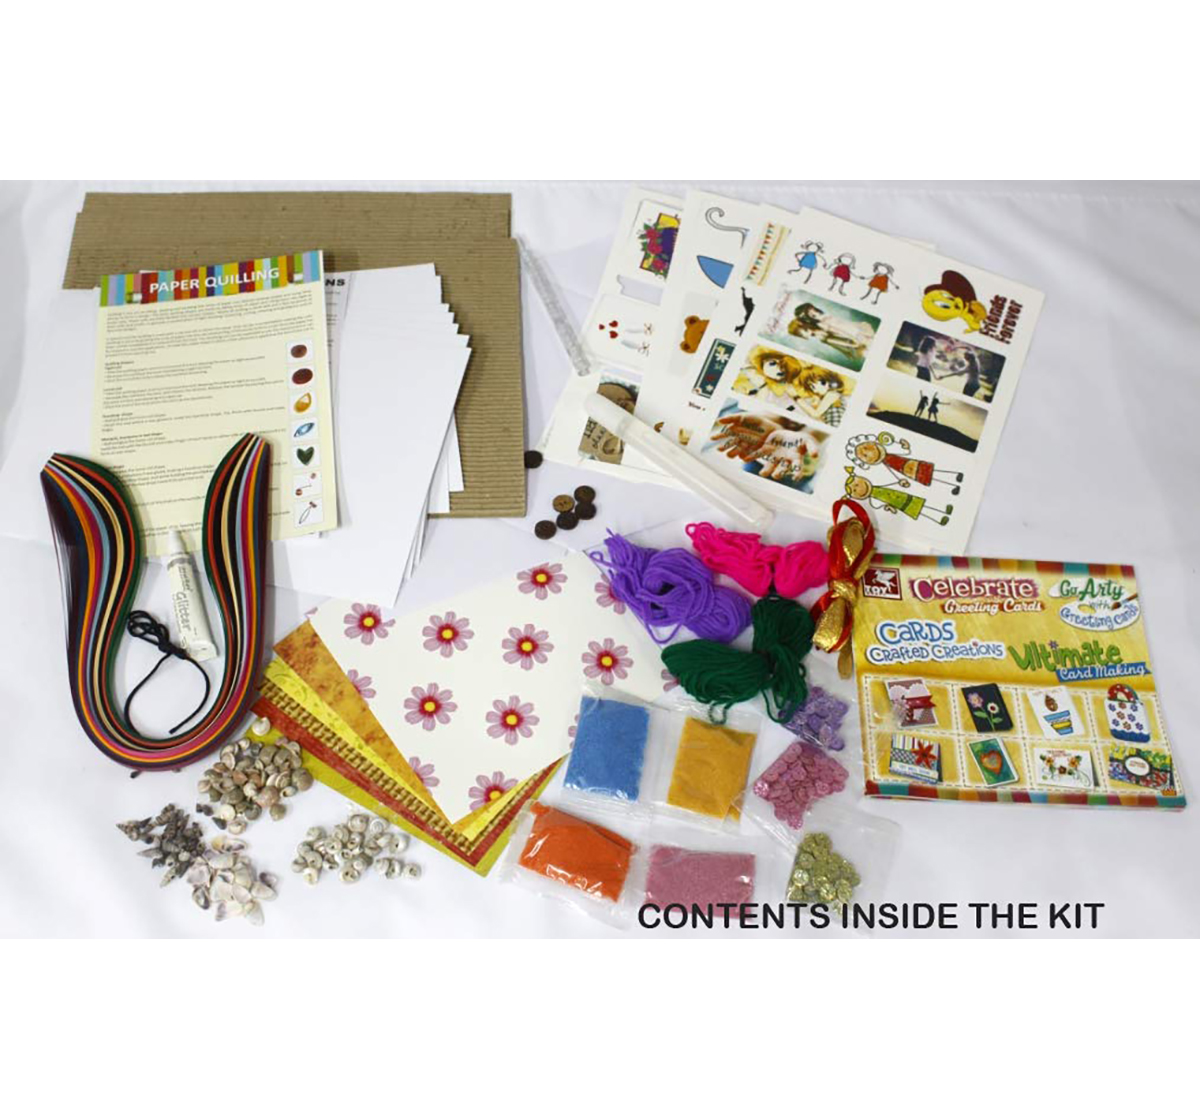 Toy Kraft | Toy Kraft Fab Card Displays DIY Art & Craft Kits for Kids age 7Y+